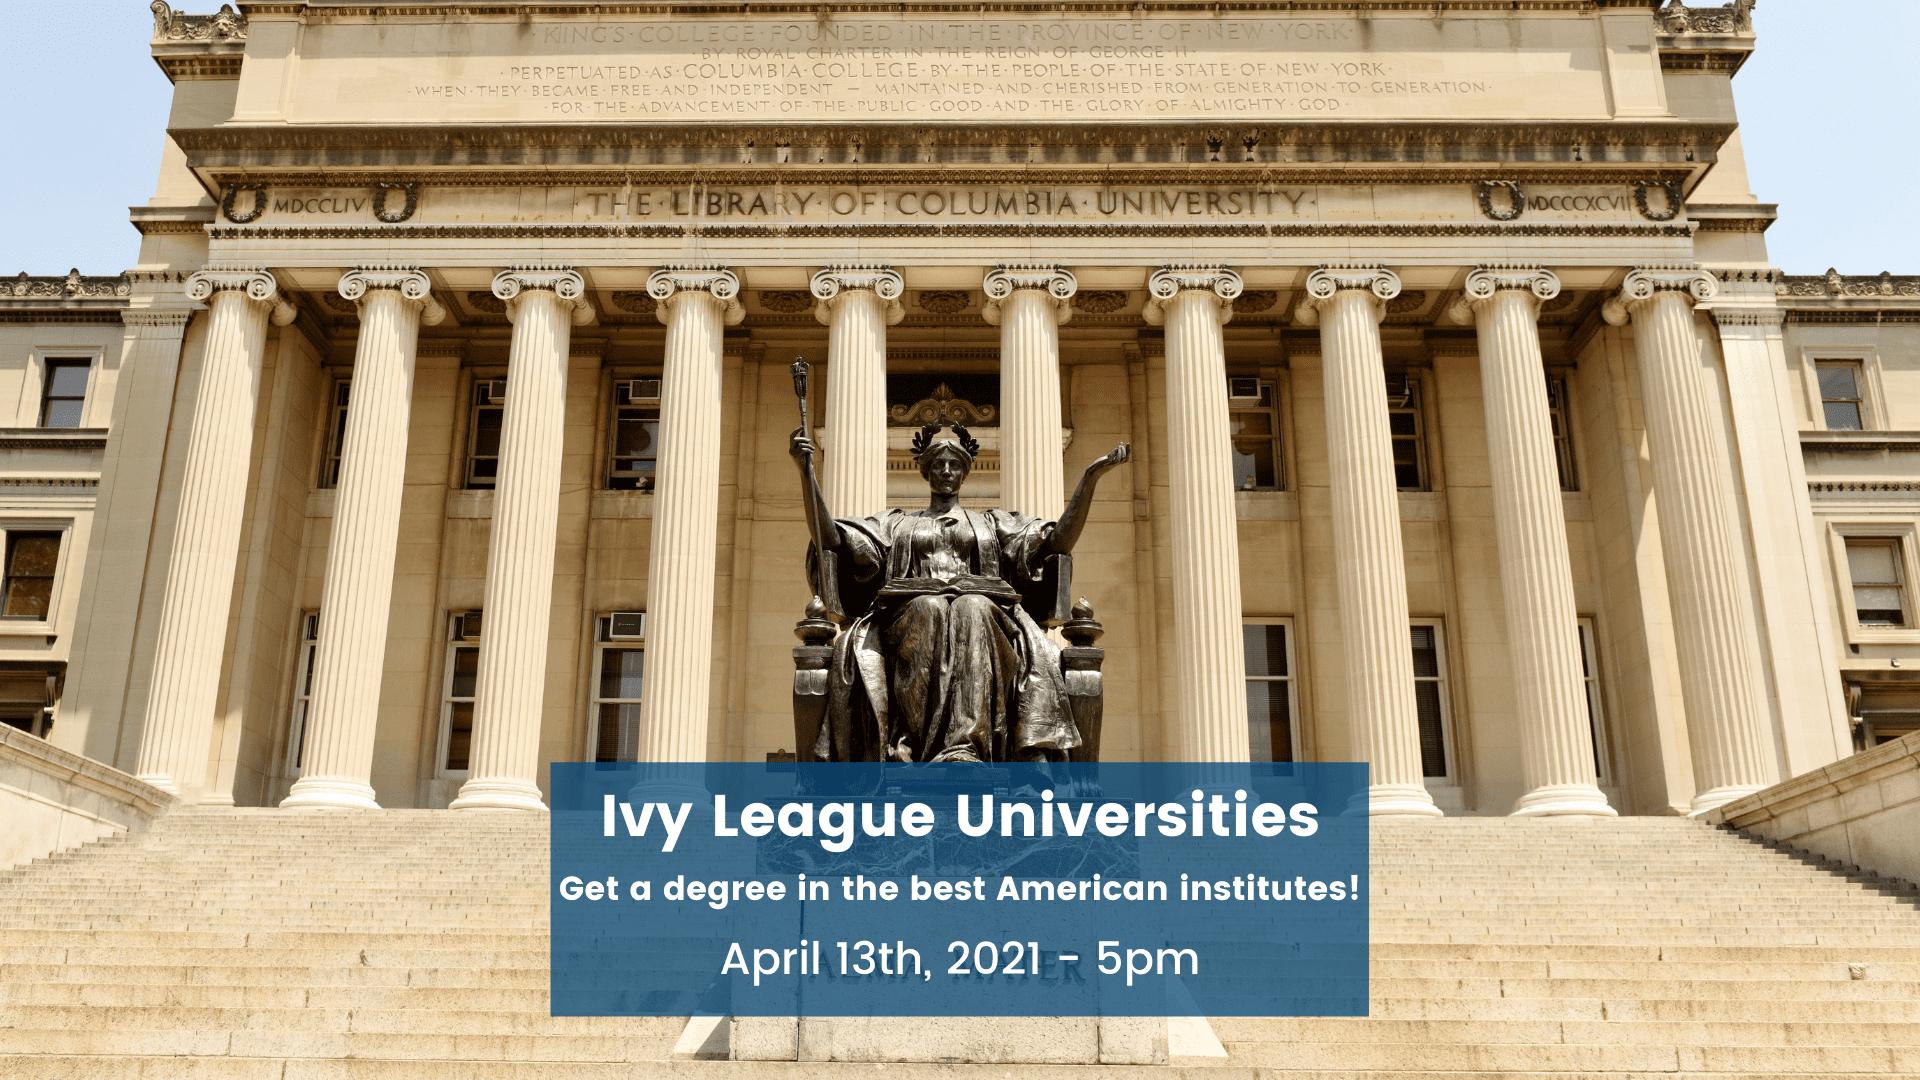 Ivy League Universities usa